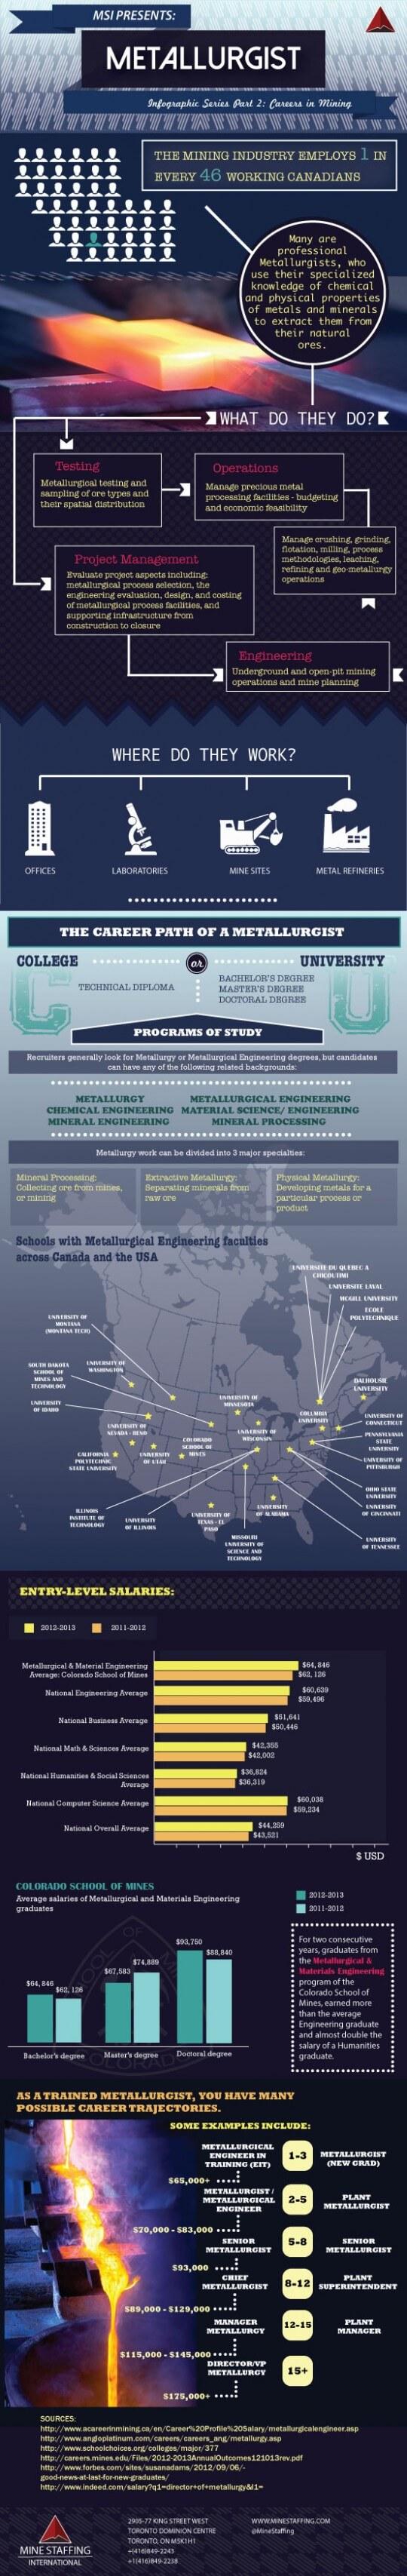 Metallurgist Salary Range